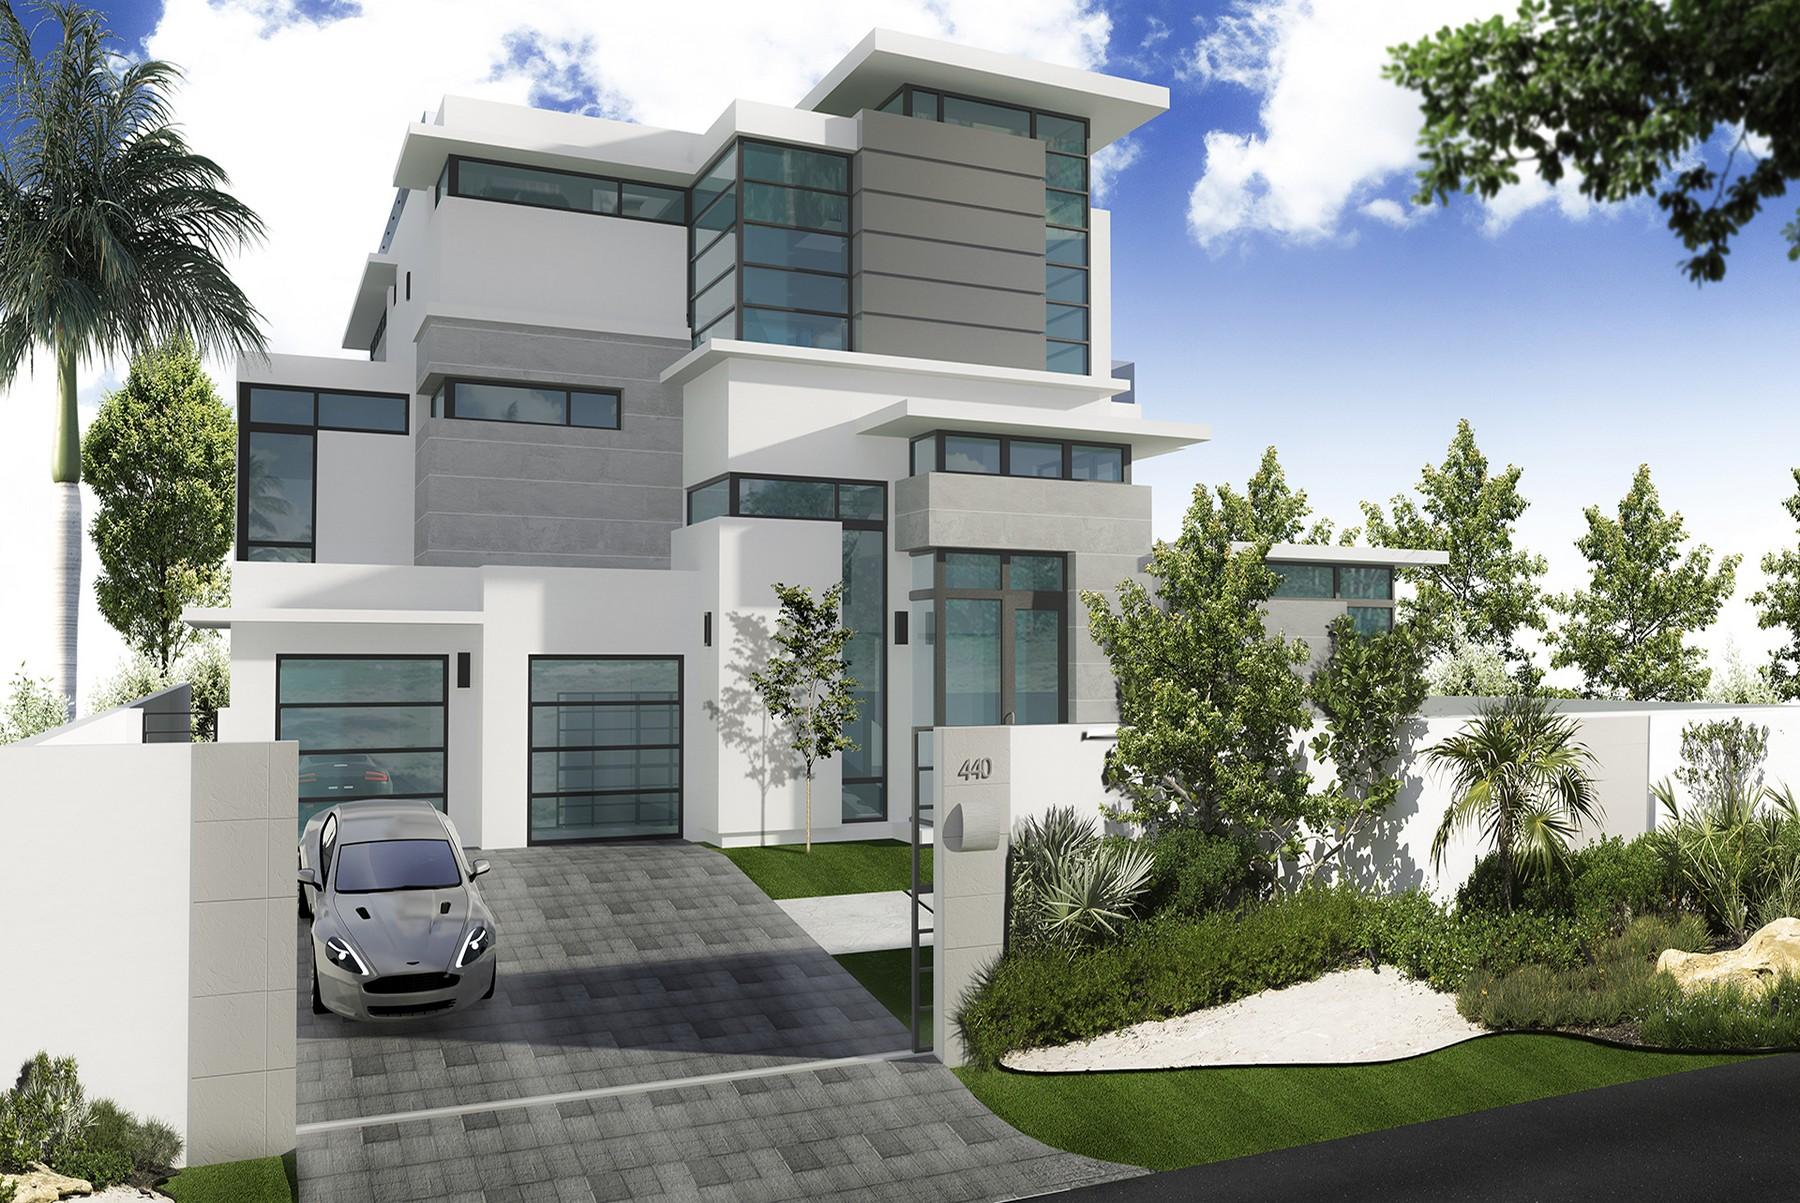 独户住宅 为 销售 在 440 Mola Ave. Fort Lauderdale, 佛罗里达州 33301 美国